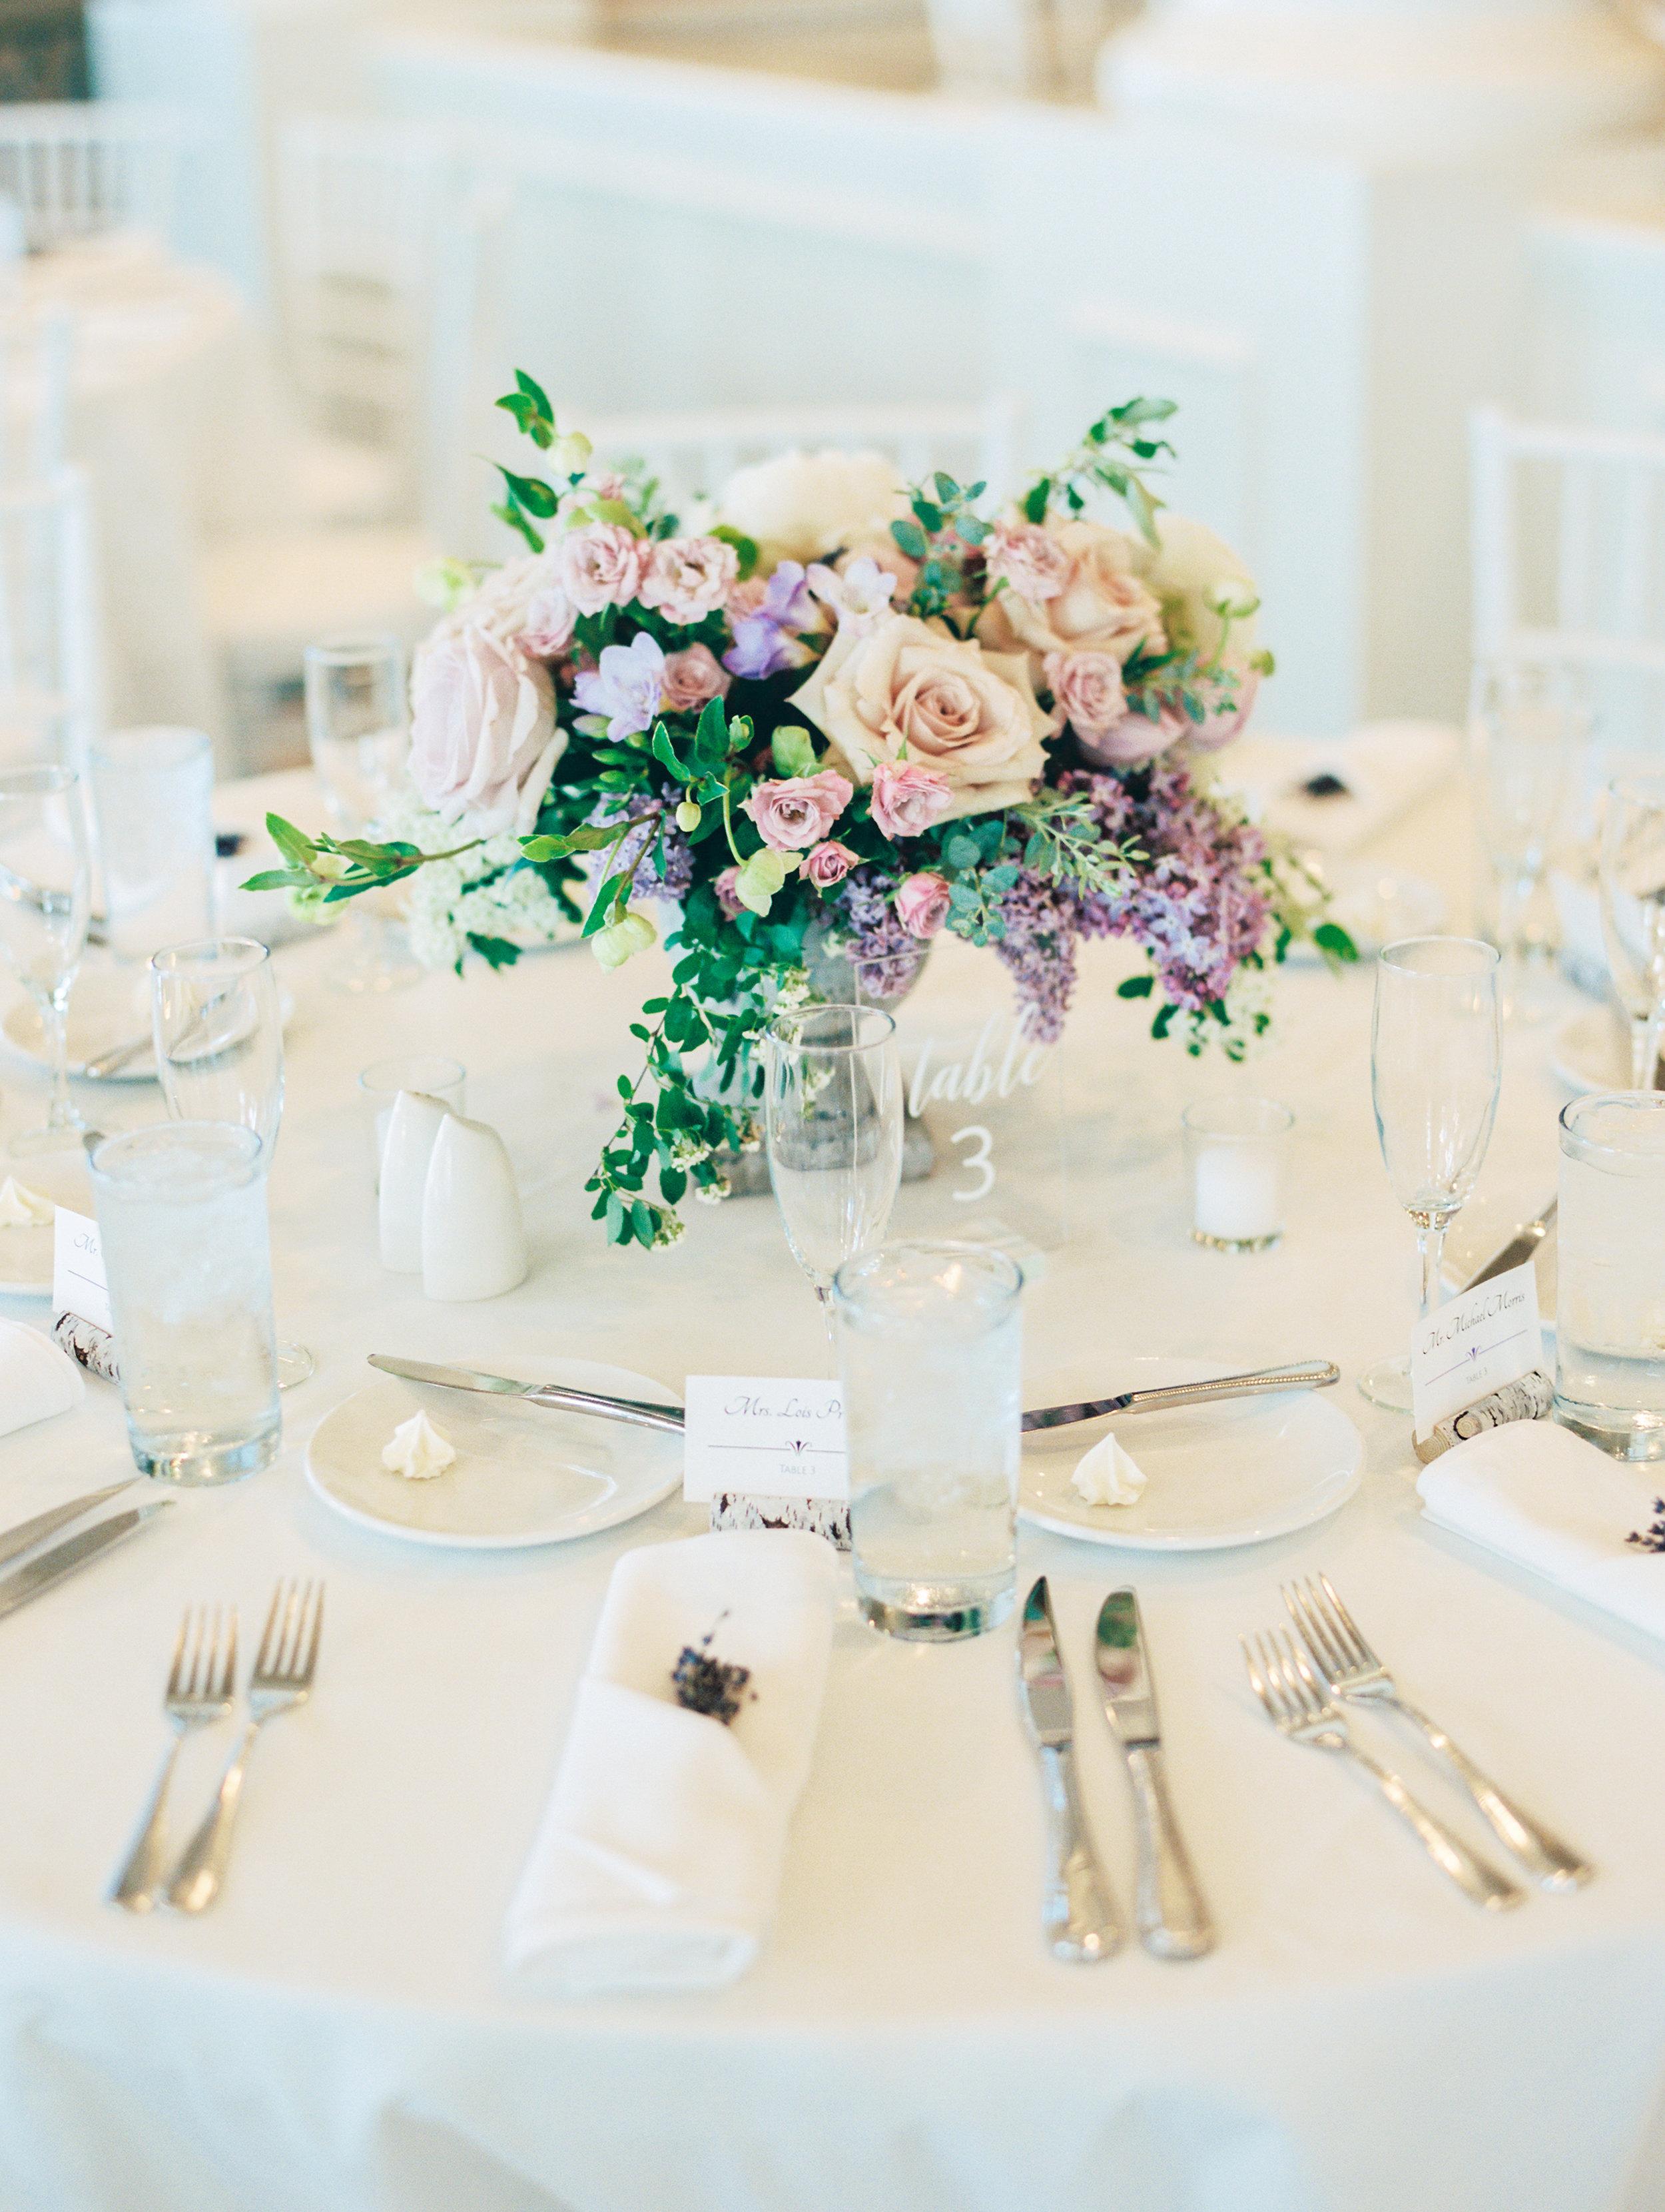 Noss+Wedding+Reception+Details-45.jpg